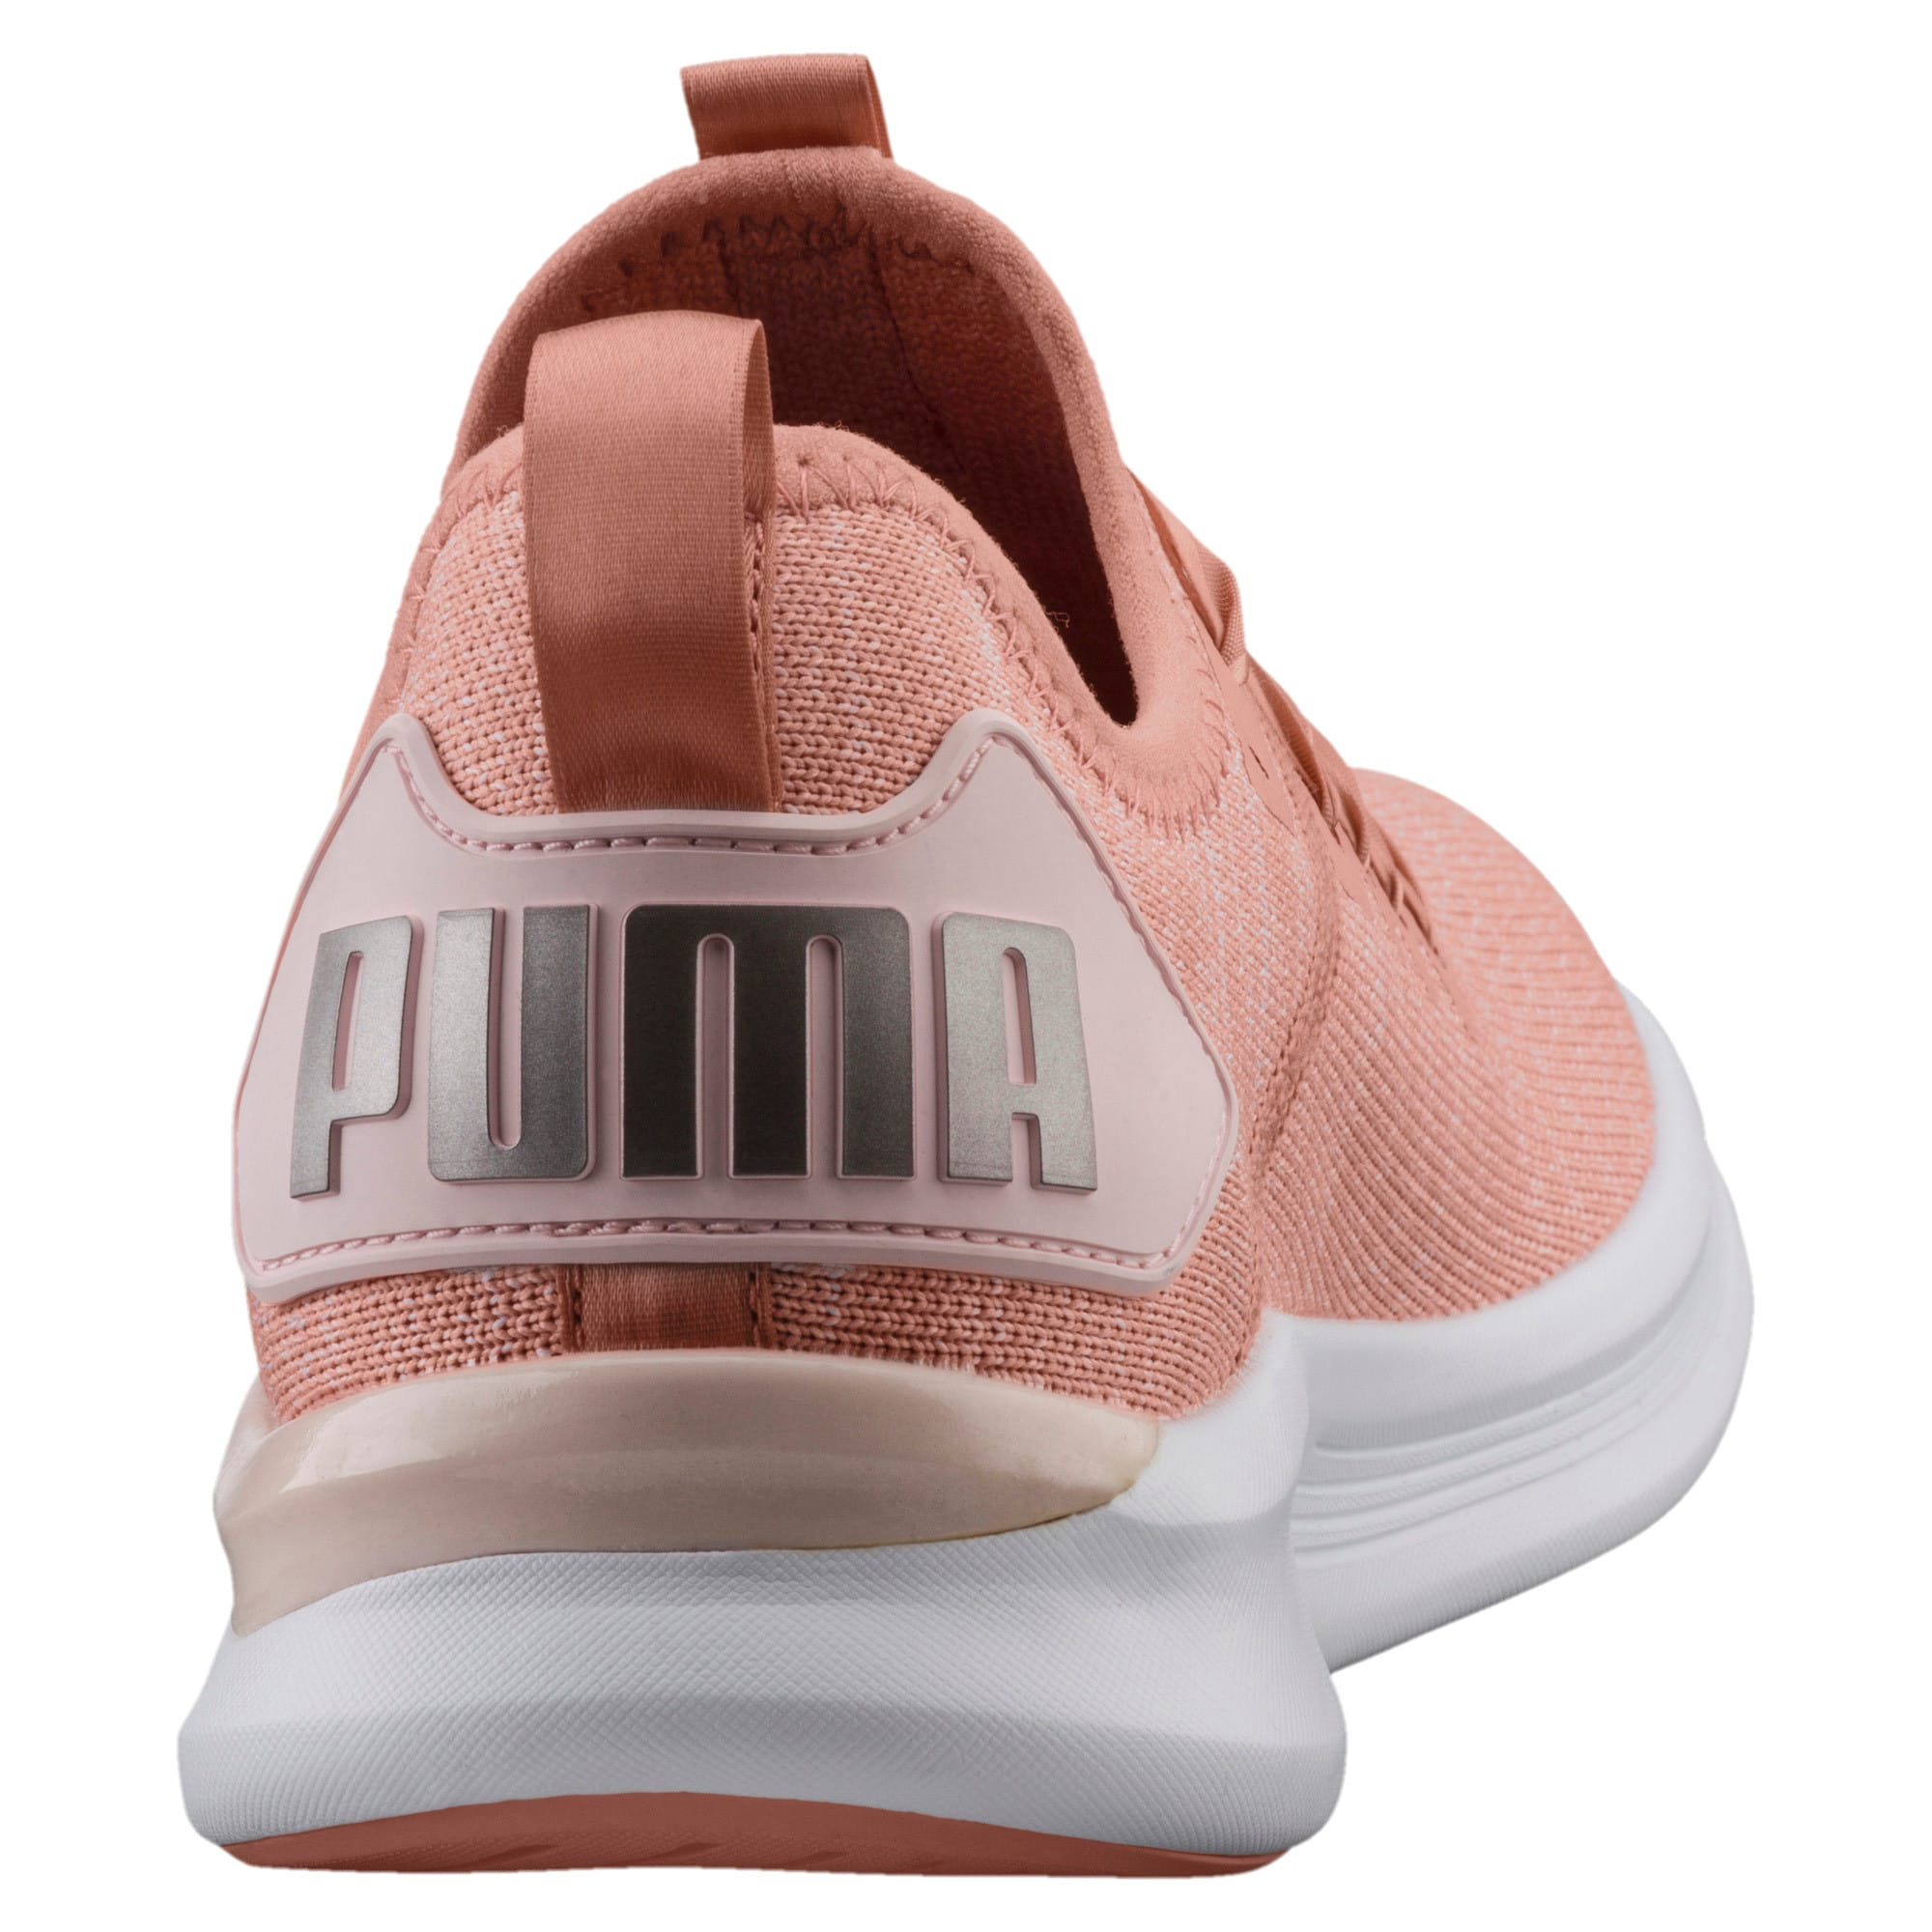 timeless design b0b46 260f2 IGNITE Flash evoKNIT Satin En Pointe Women's Sneakers